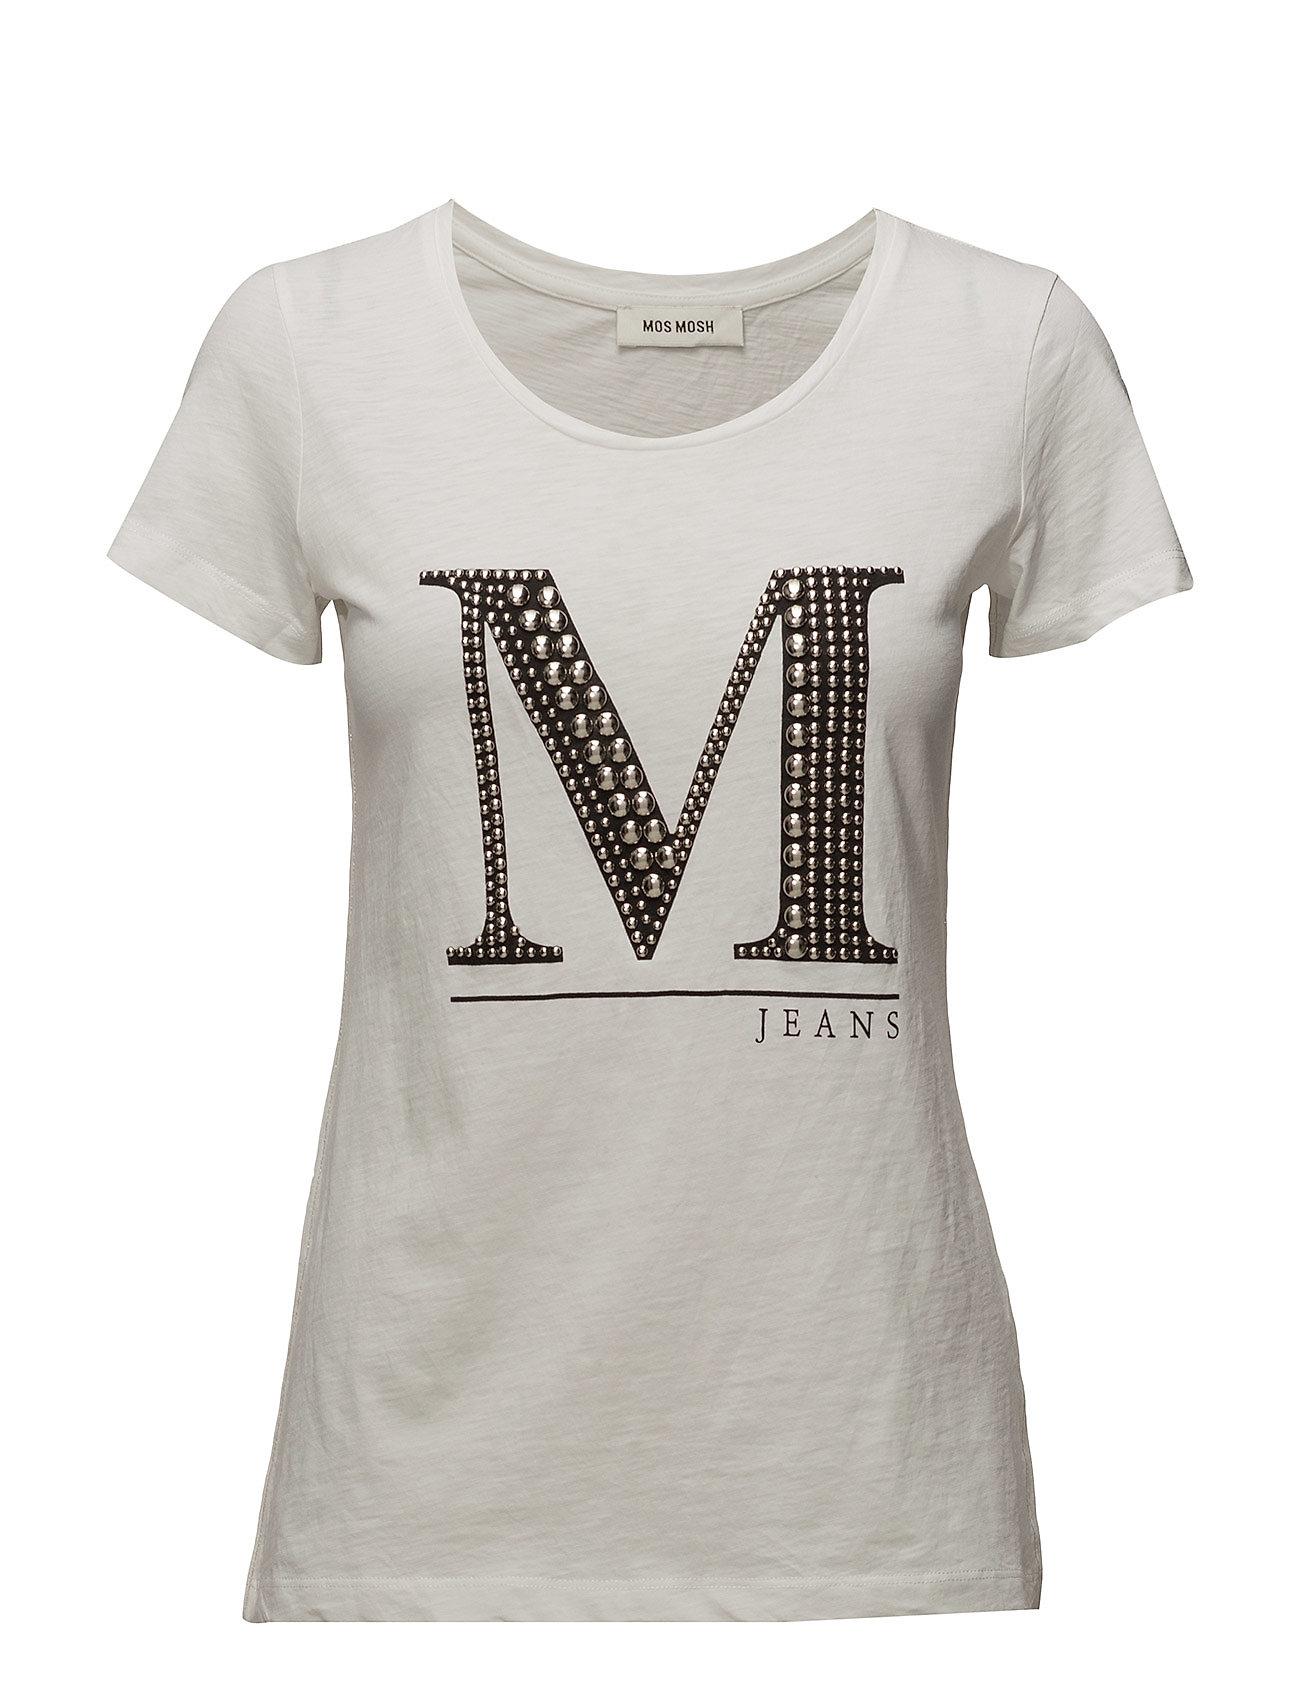 T-Shirt - WEISS Mos Mosh FmFODxc